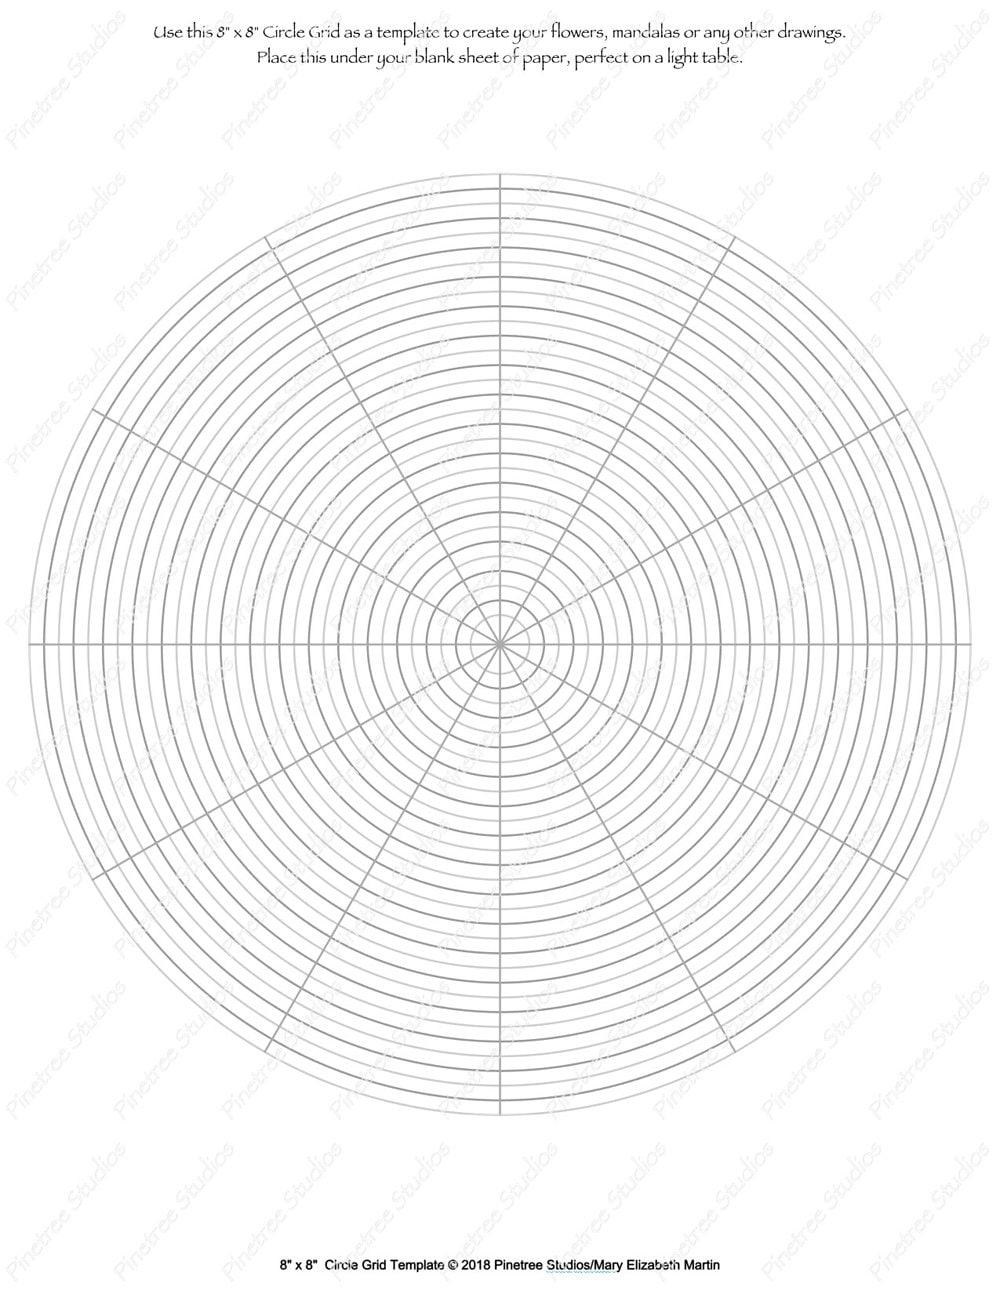 Circle grid for drawing flowers mandalas and more digital download circle grid for drawing flowers mandalas and more digital download printable create ovals ipad pro procreate autodesk sketchbook maxwellsz